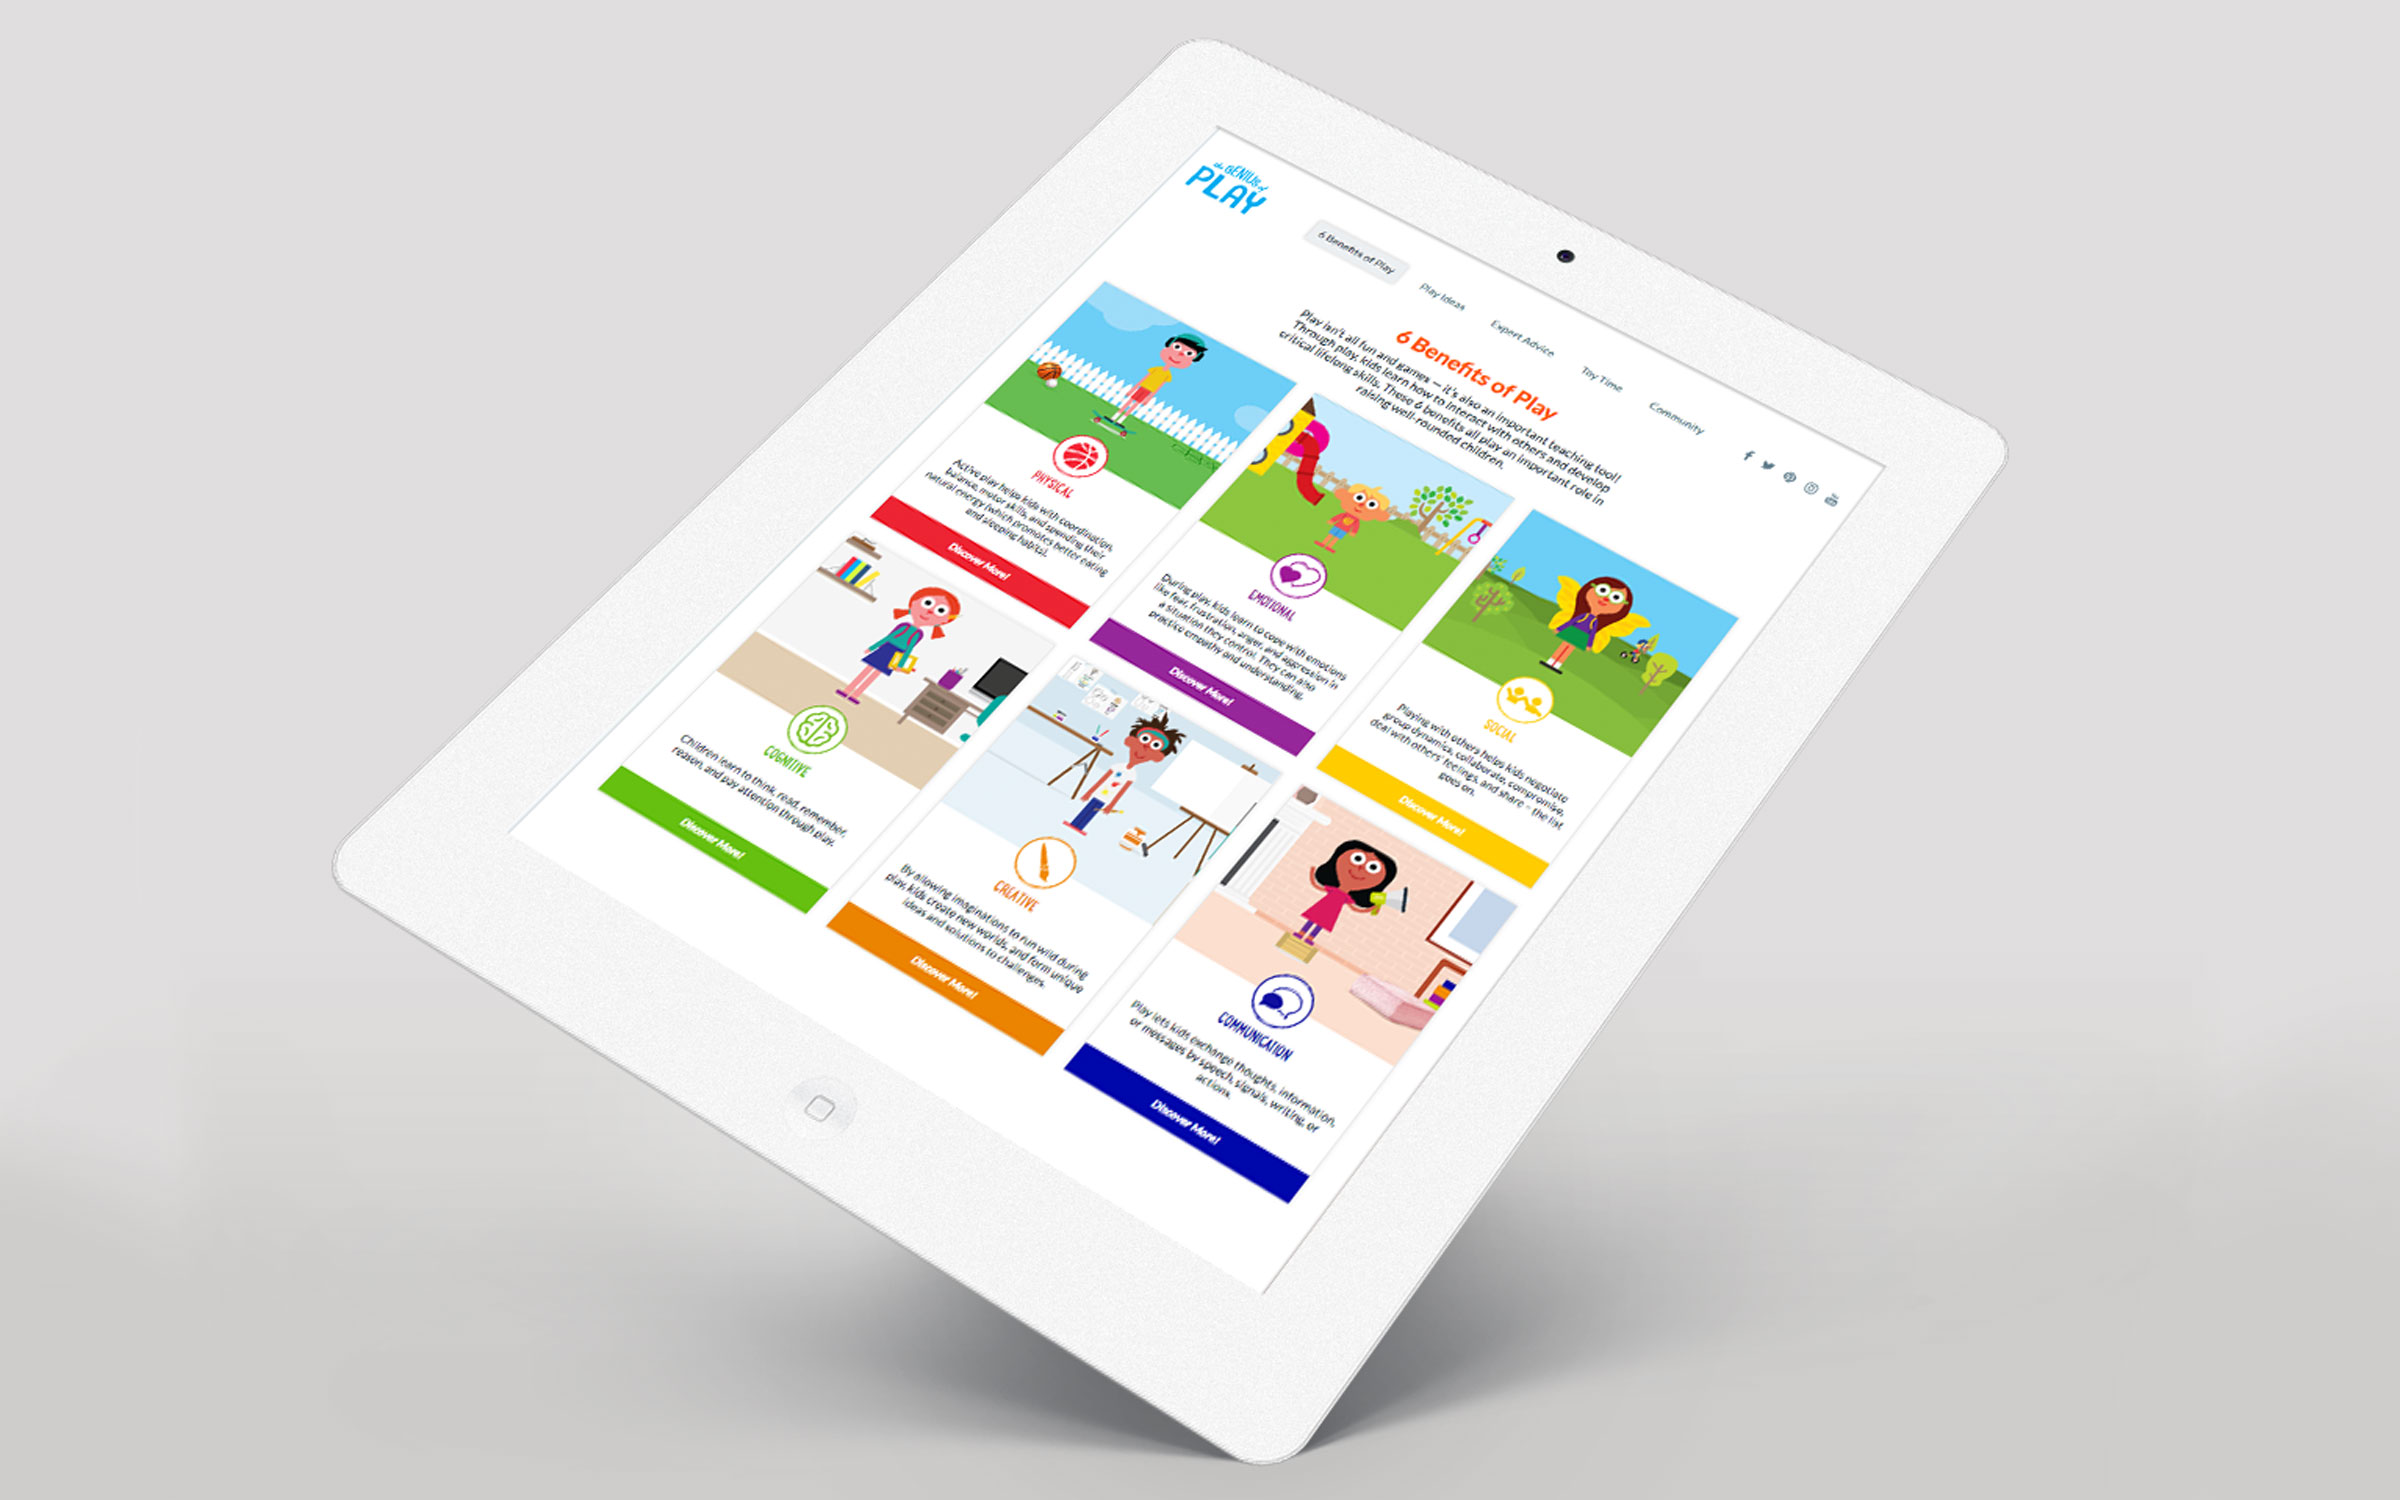 Genius of Play website on an iPad